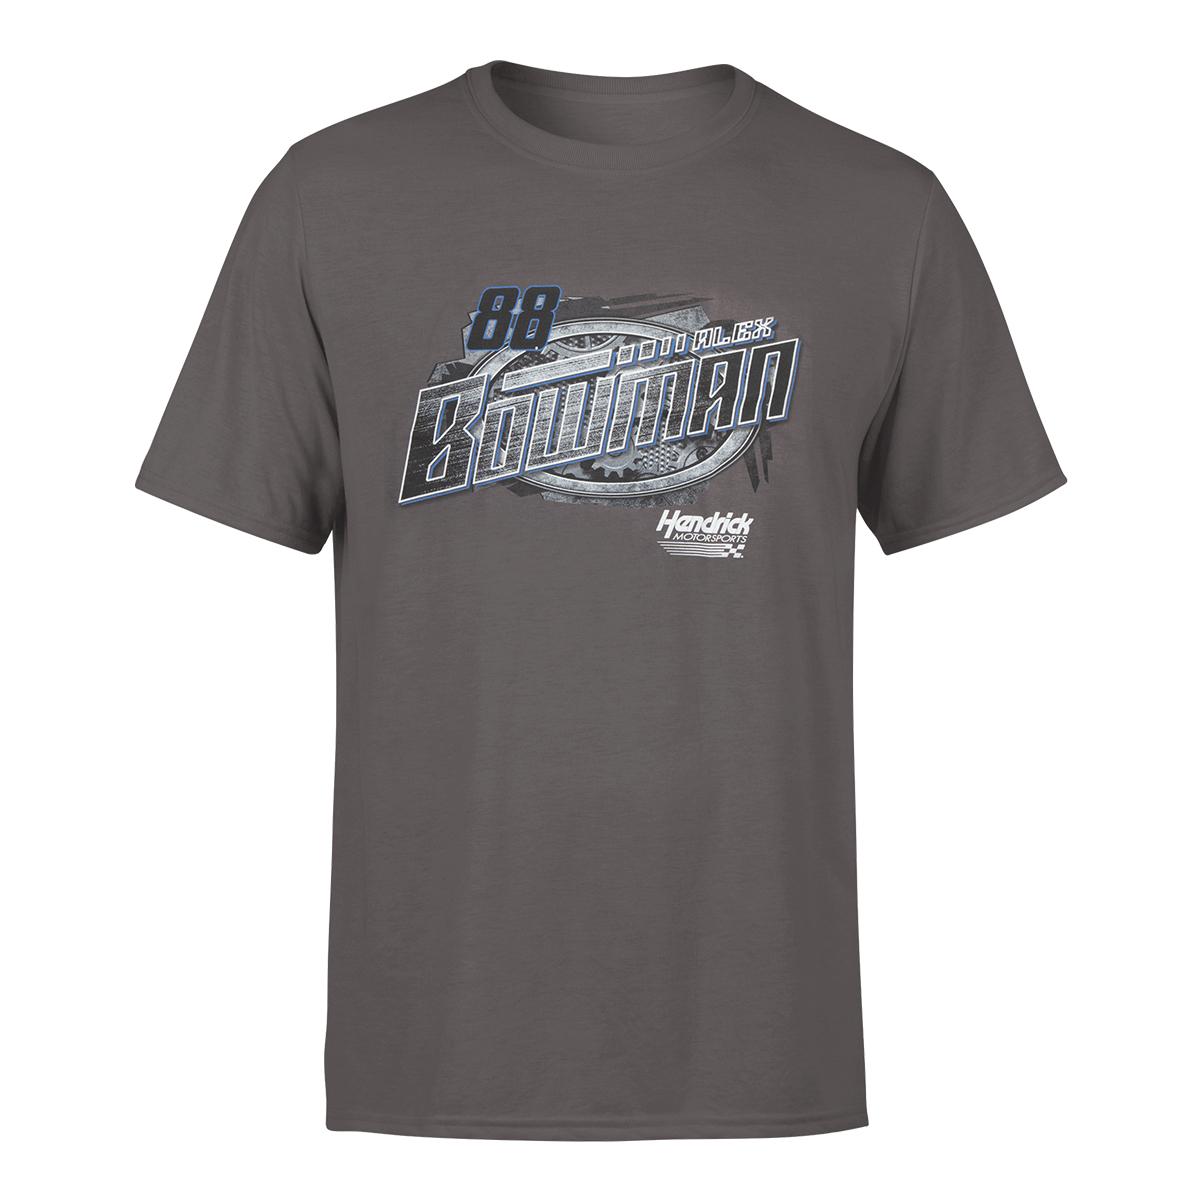 Alex Bowman #88 2019 NASCAR Steel Thunder T-shirt